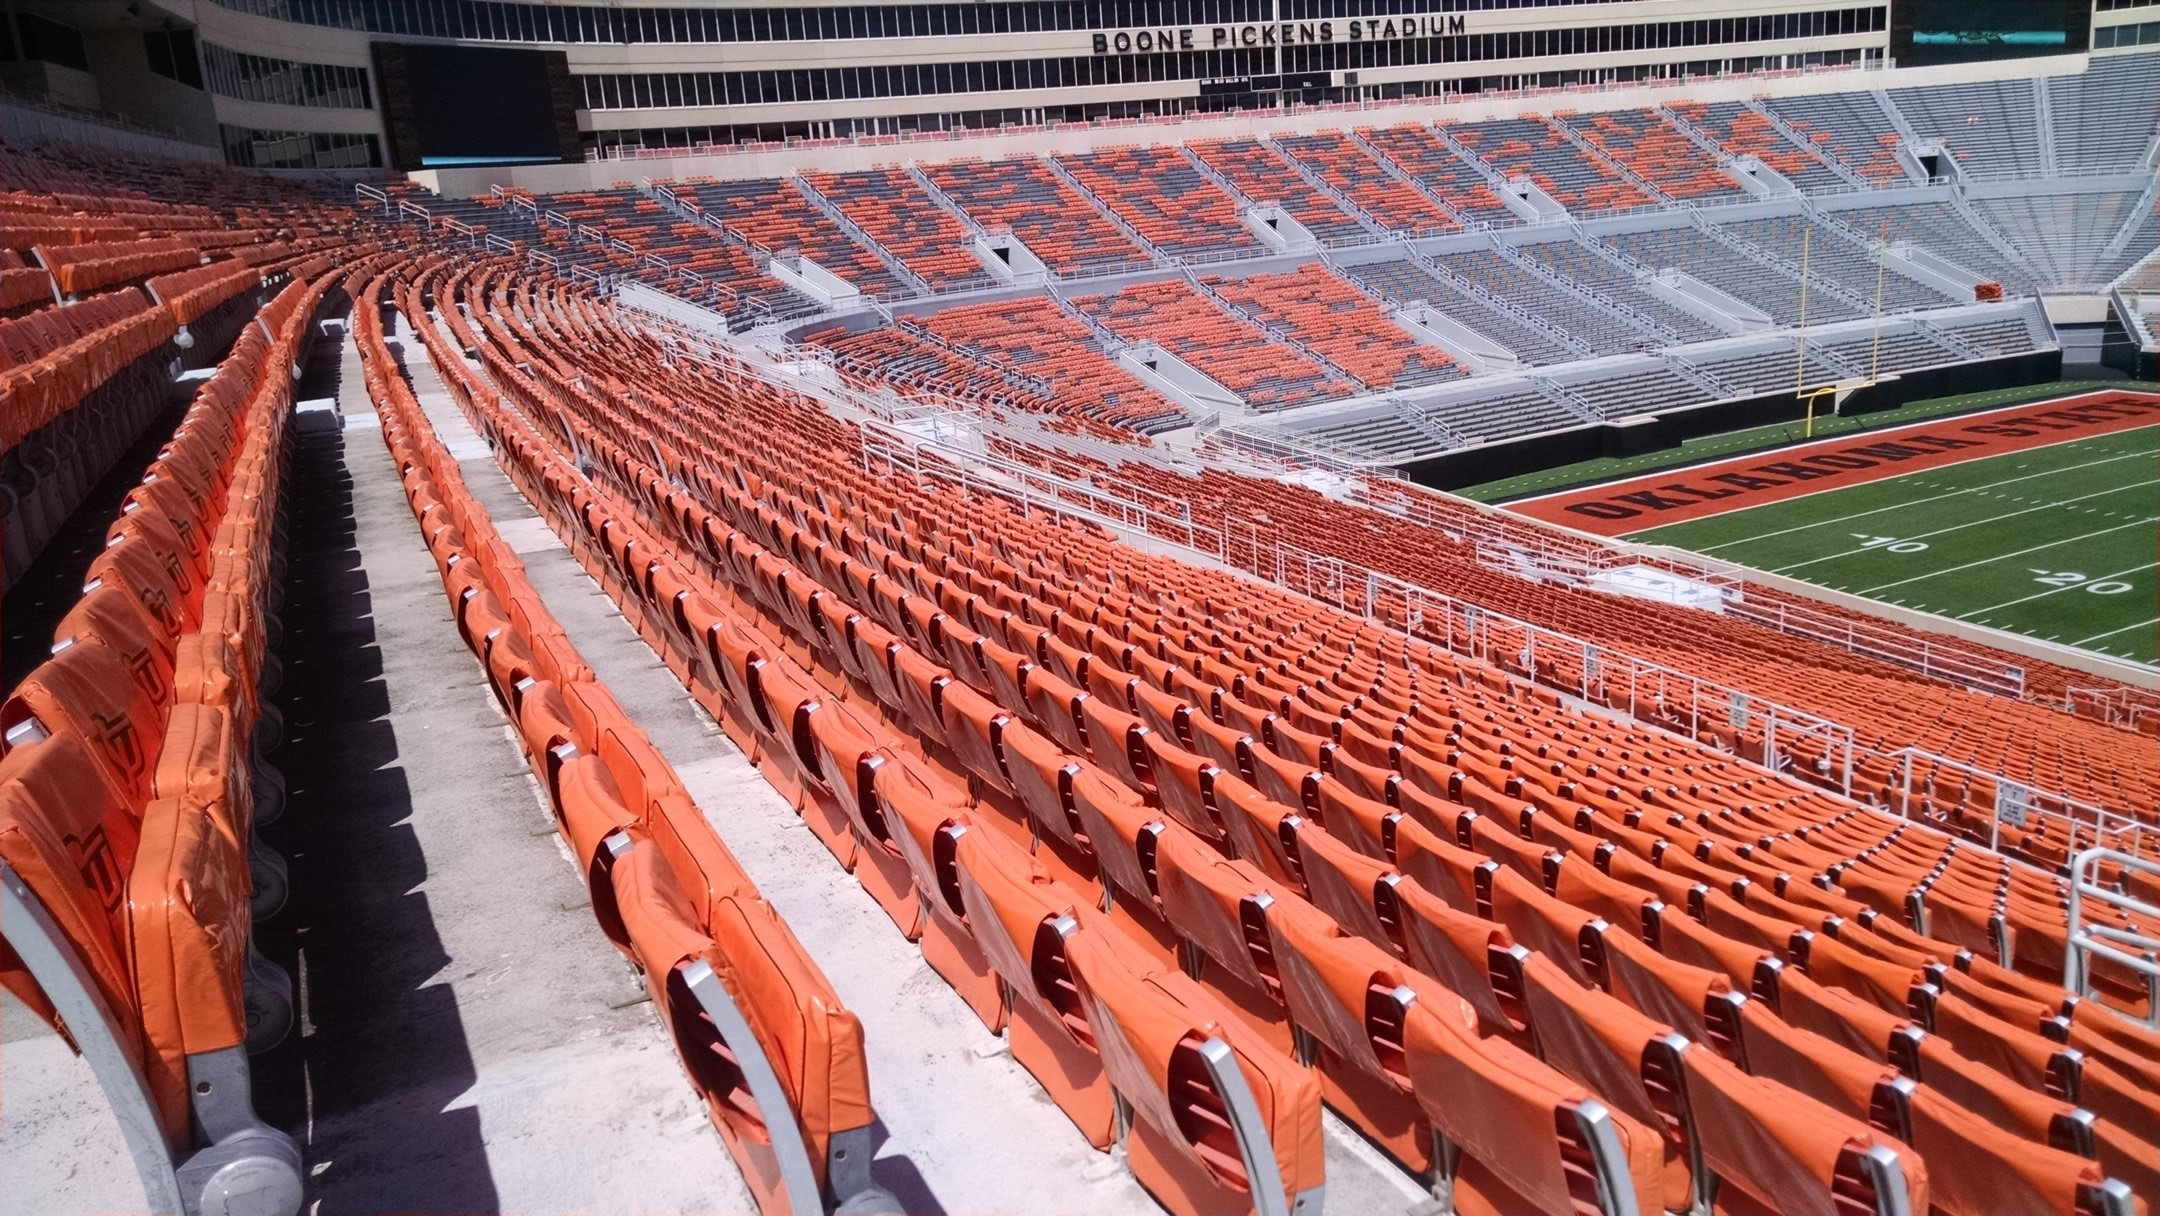 Boone Pickens Stadium 300 Level Sideline Football